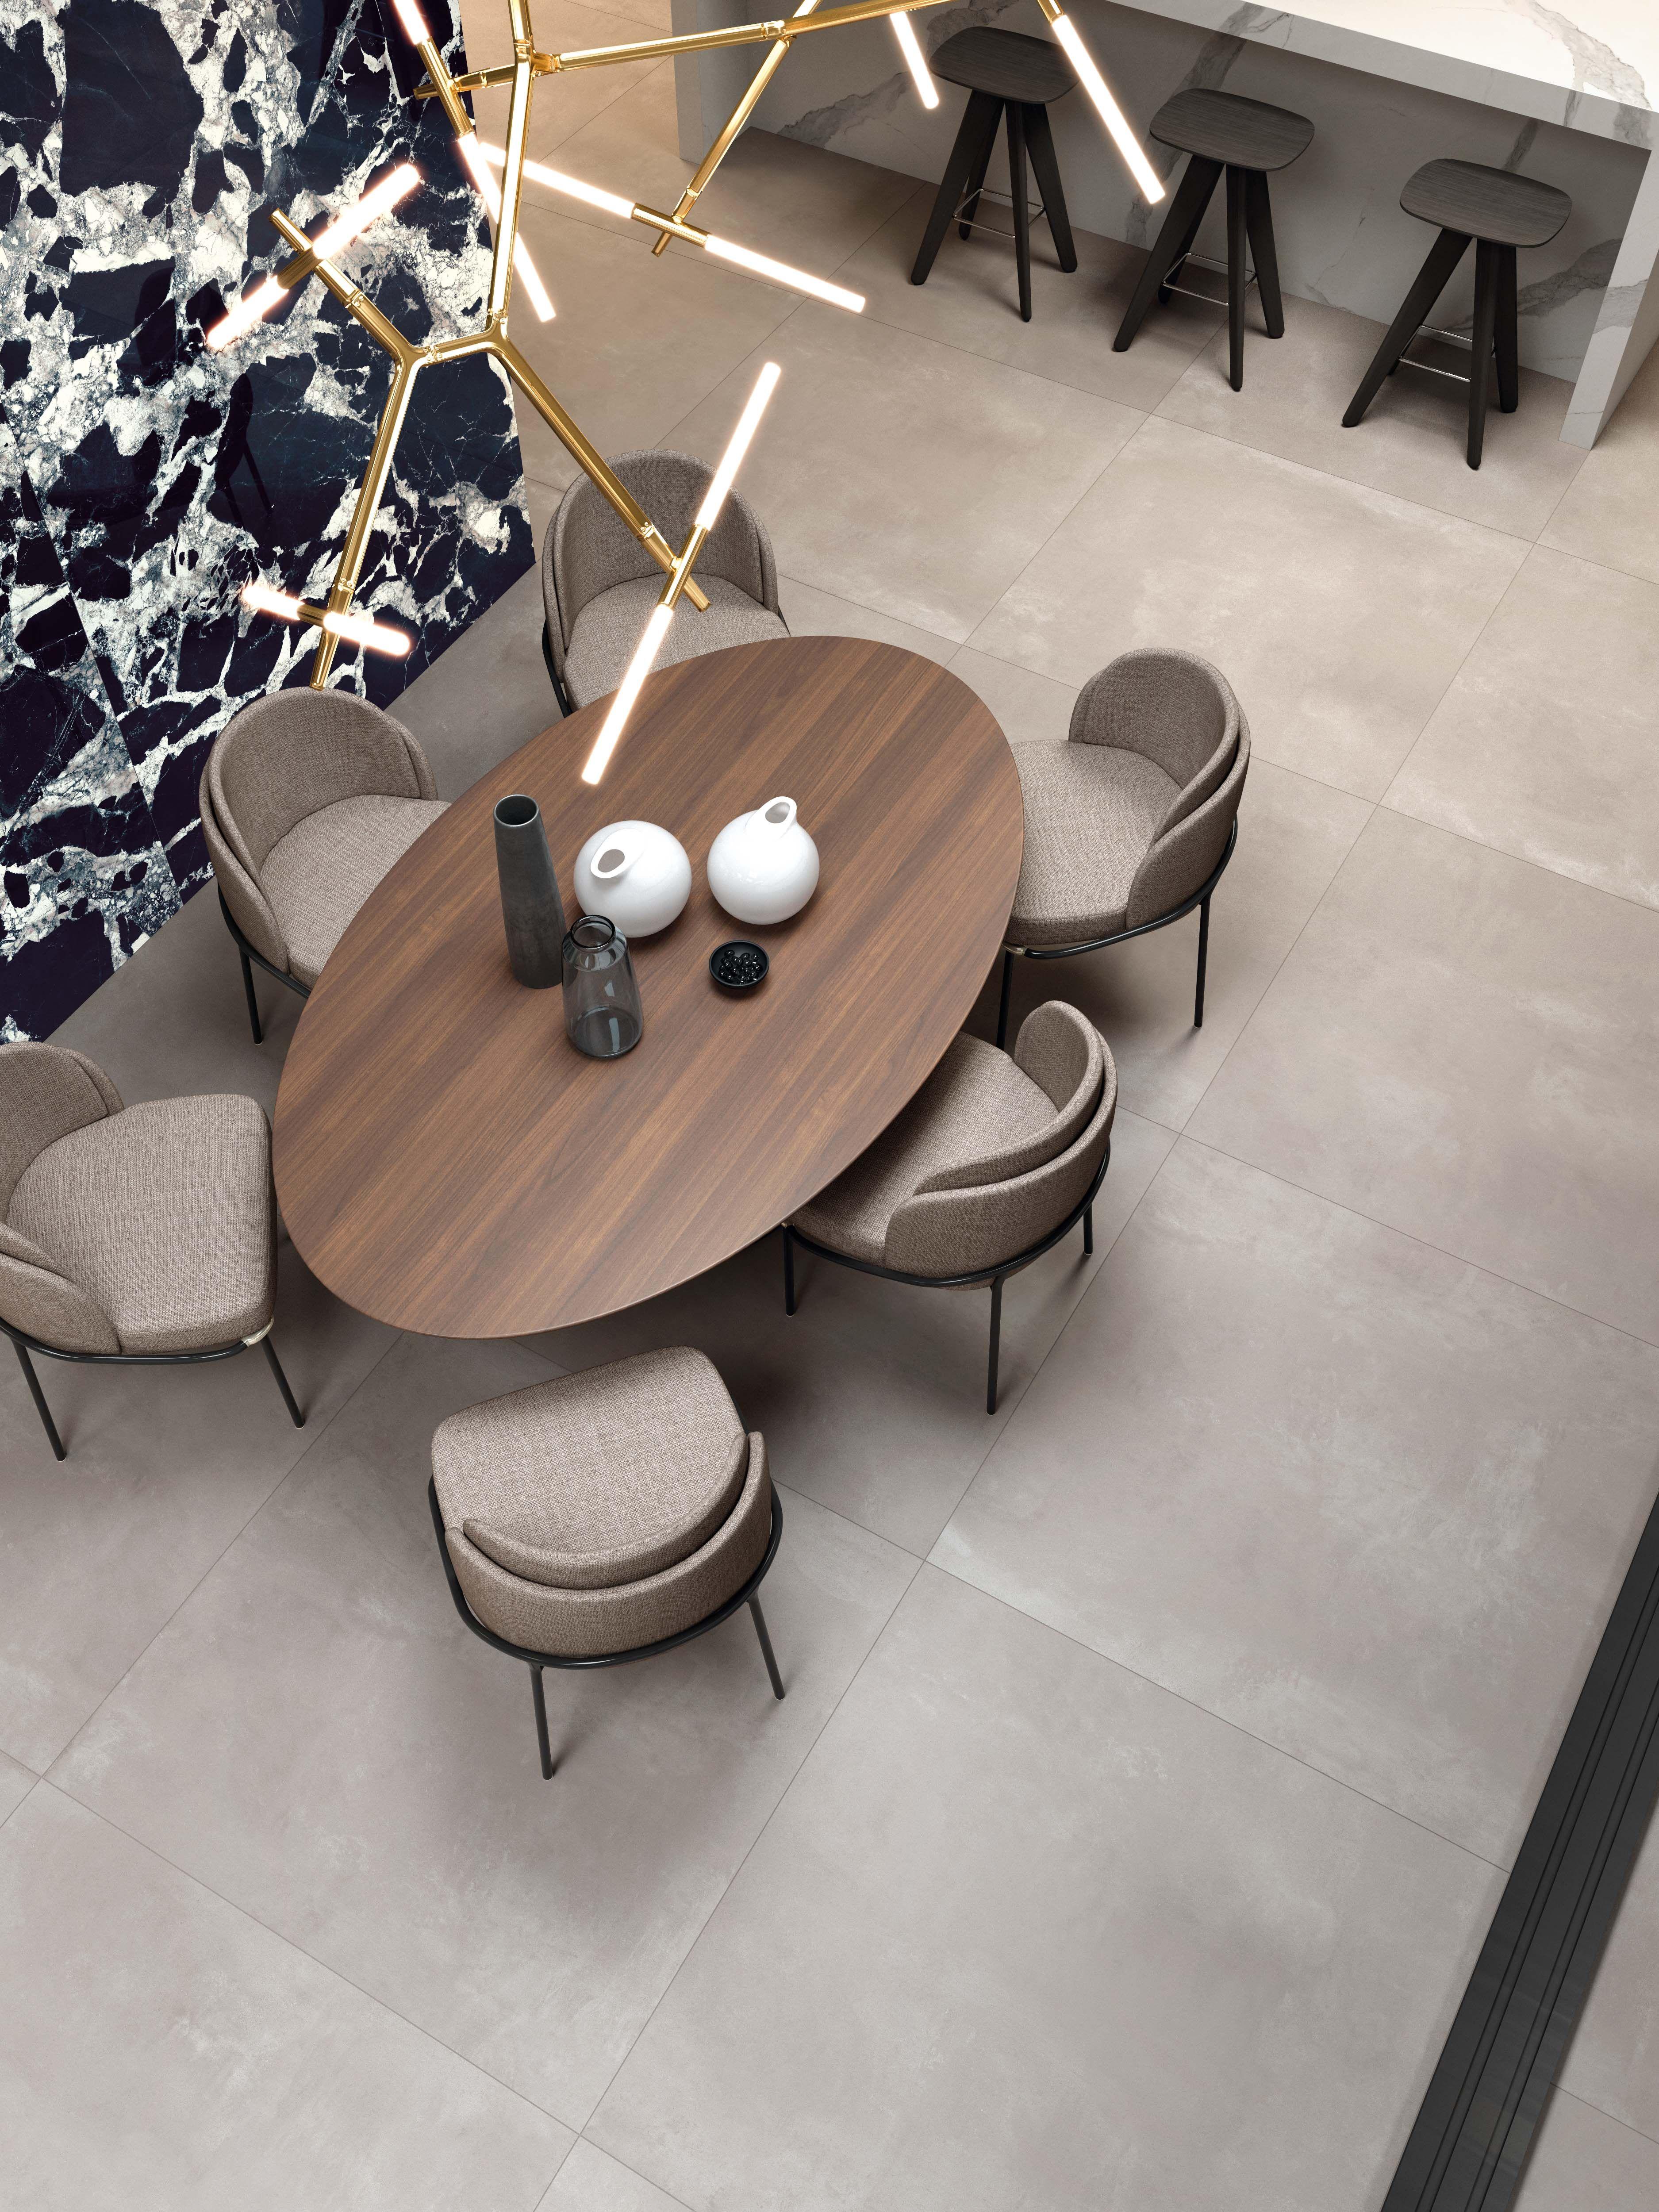 Tiles Design For Living Room Wall: Beige Stone Effect Floor & Wall Tiles For Your Living Room